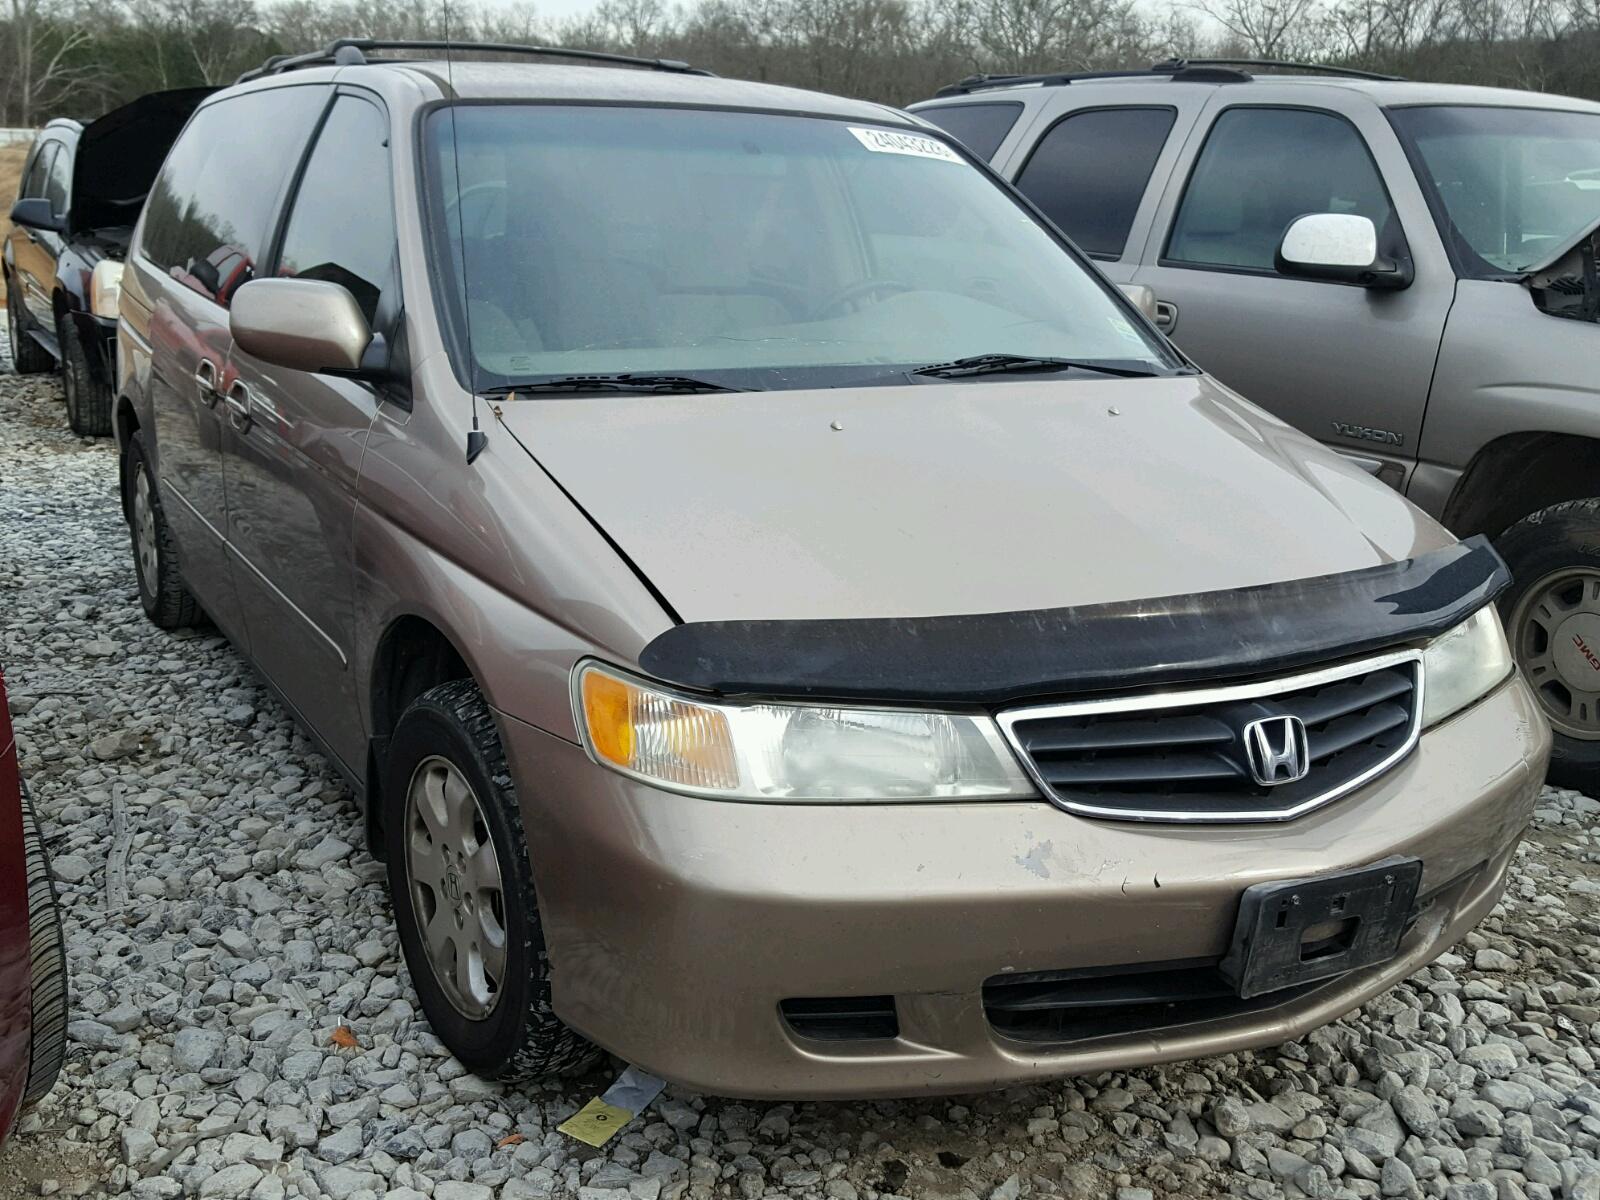 Auto Auction Ended On Vin Jhlrd284xxc000808 1999 Honda Cr V Lx In Tn Nashville